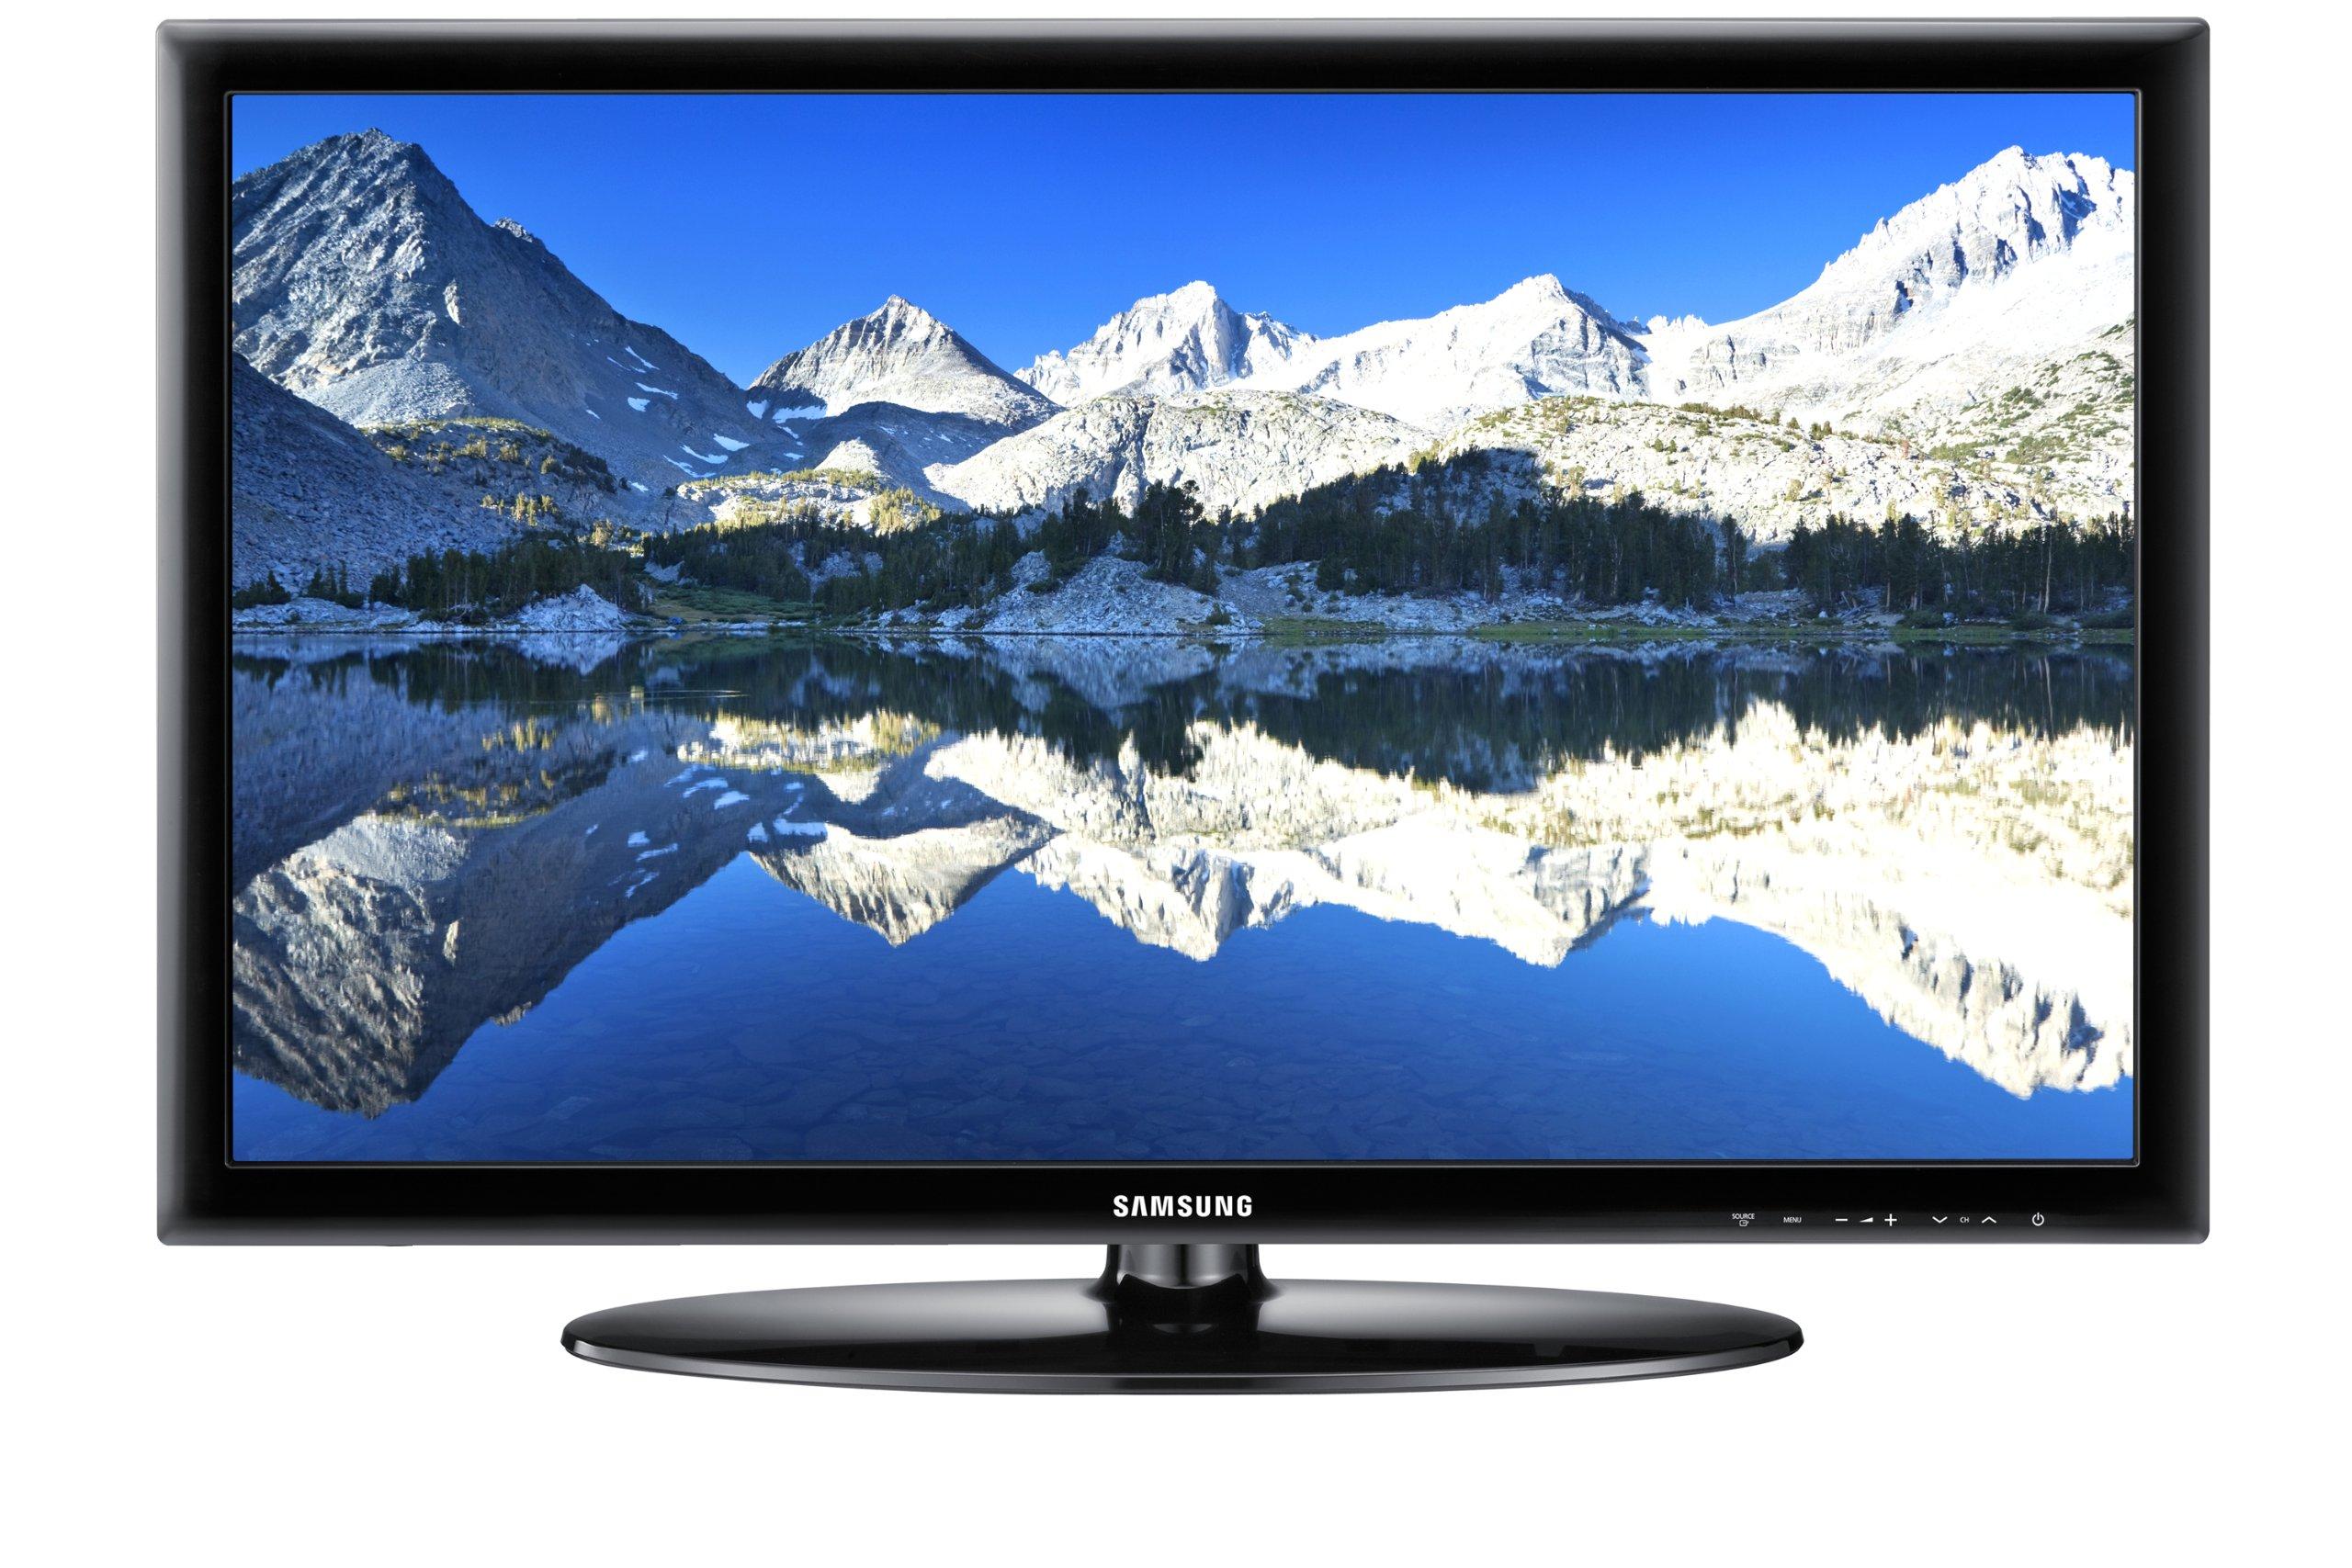 SAMSUNG Led TV USB 50Hz 26Hd Listo 2Hdmi &Quot;: Amazon.es: Electrónica